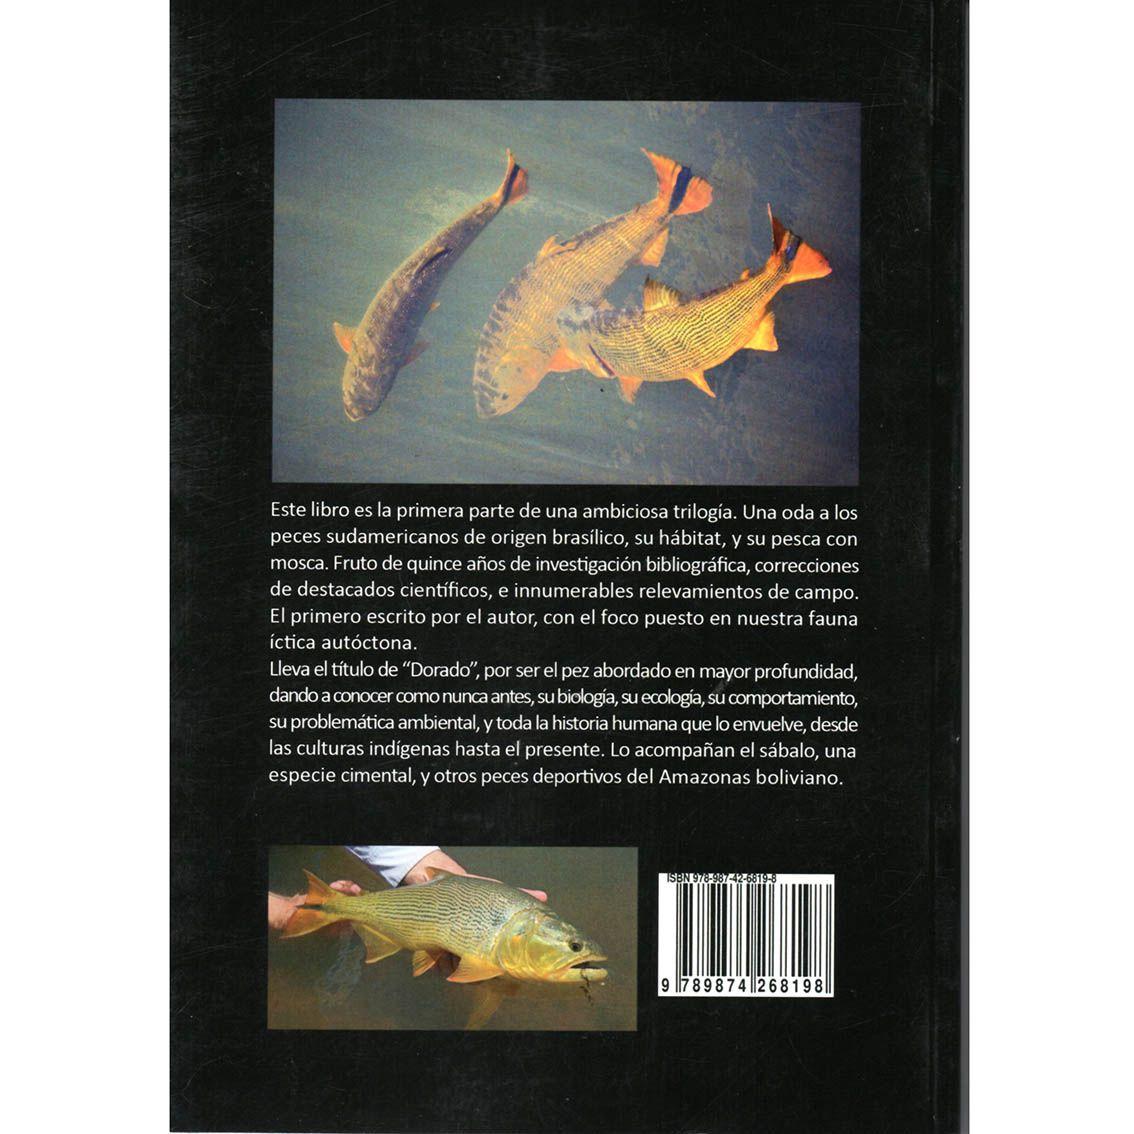 Livro Oro Del Agua - Volumen I: Dorado (Diego Flores)